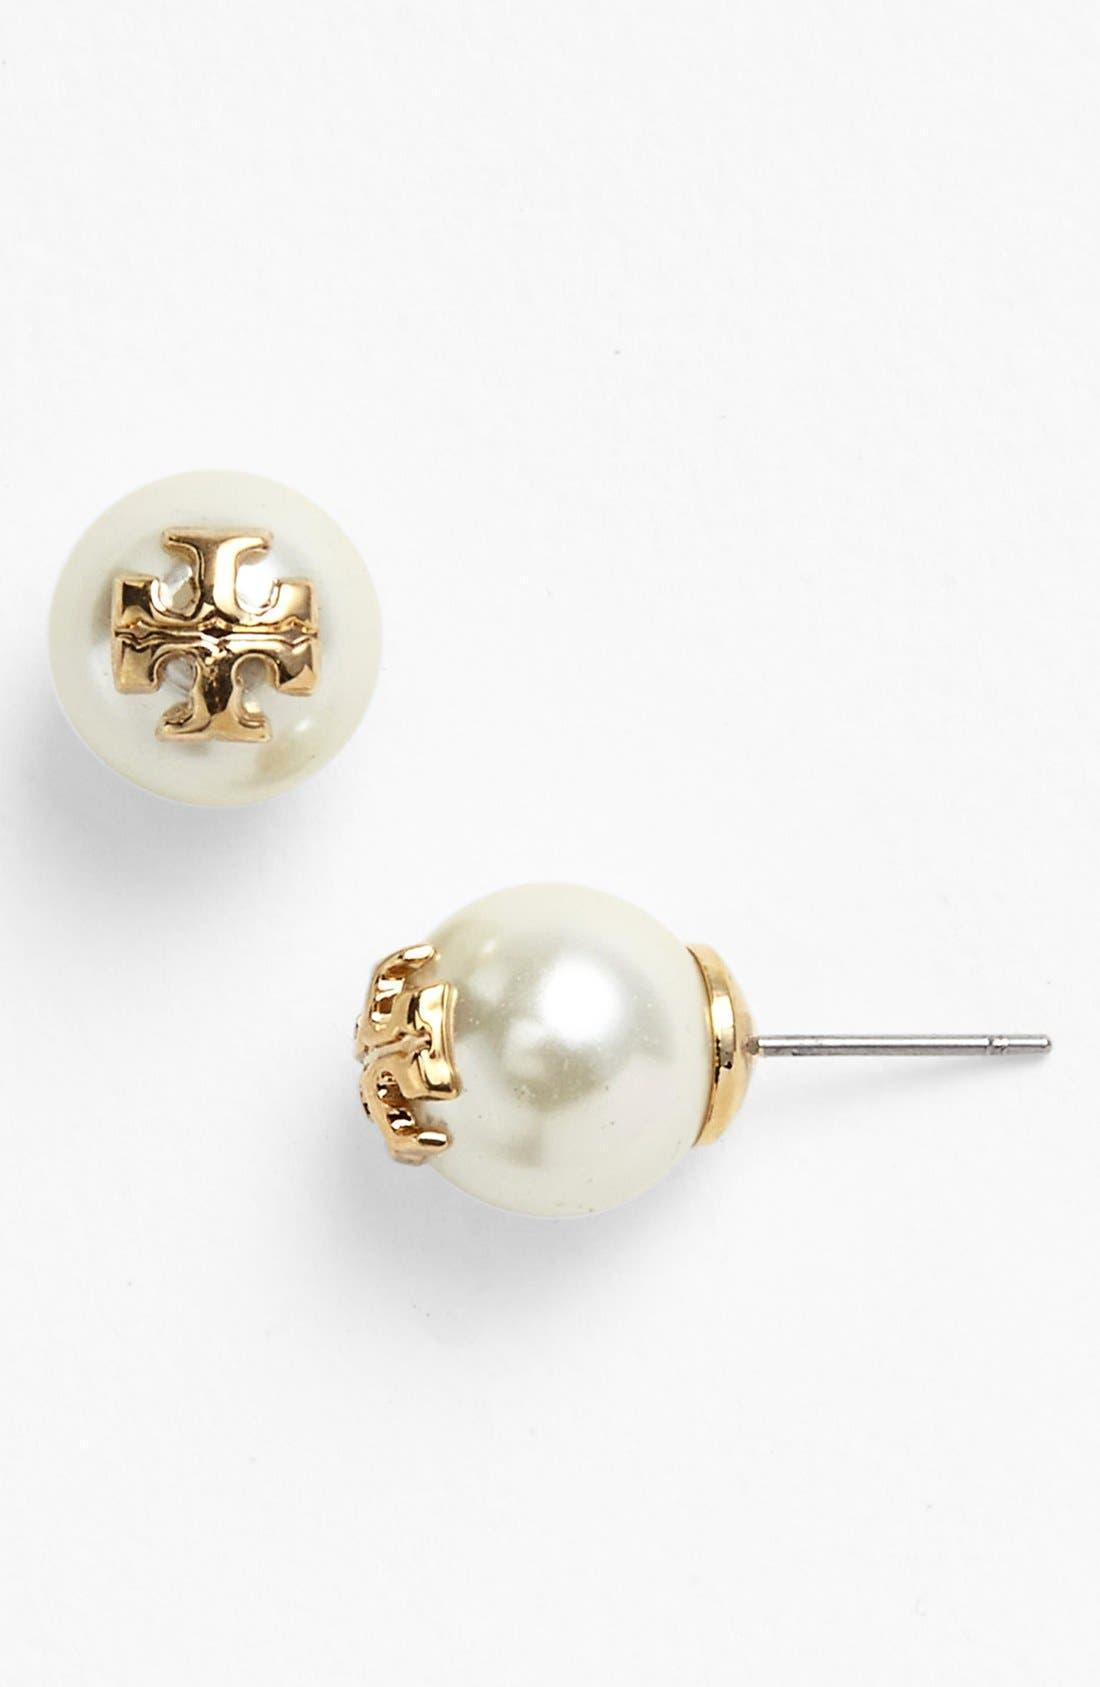 Main Image - Tory Burch 'Evie' Swarovski Crystal Pearl Earrings